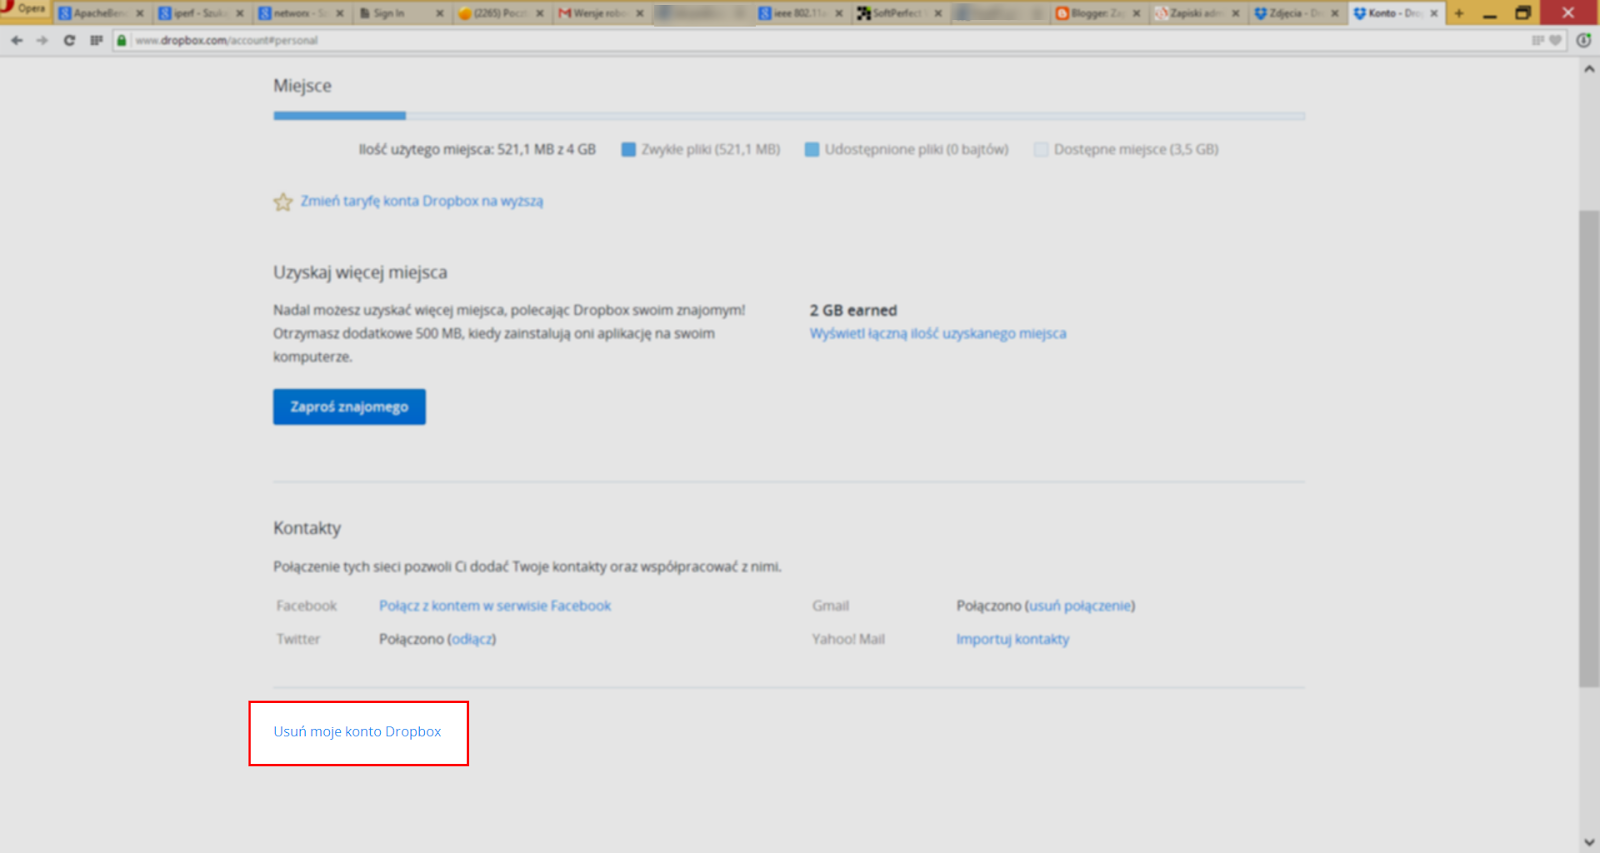 Opcja usunięcia konta Dropbox